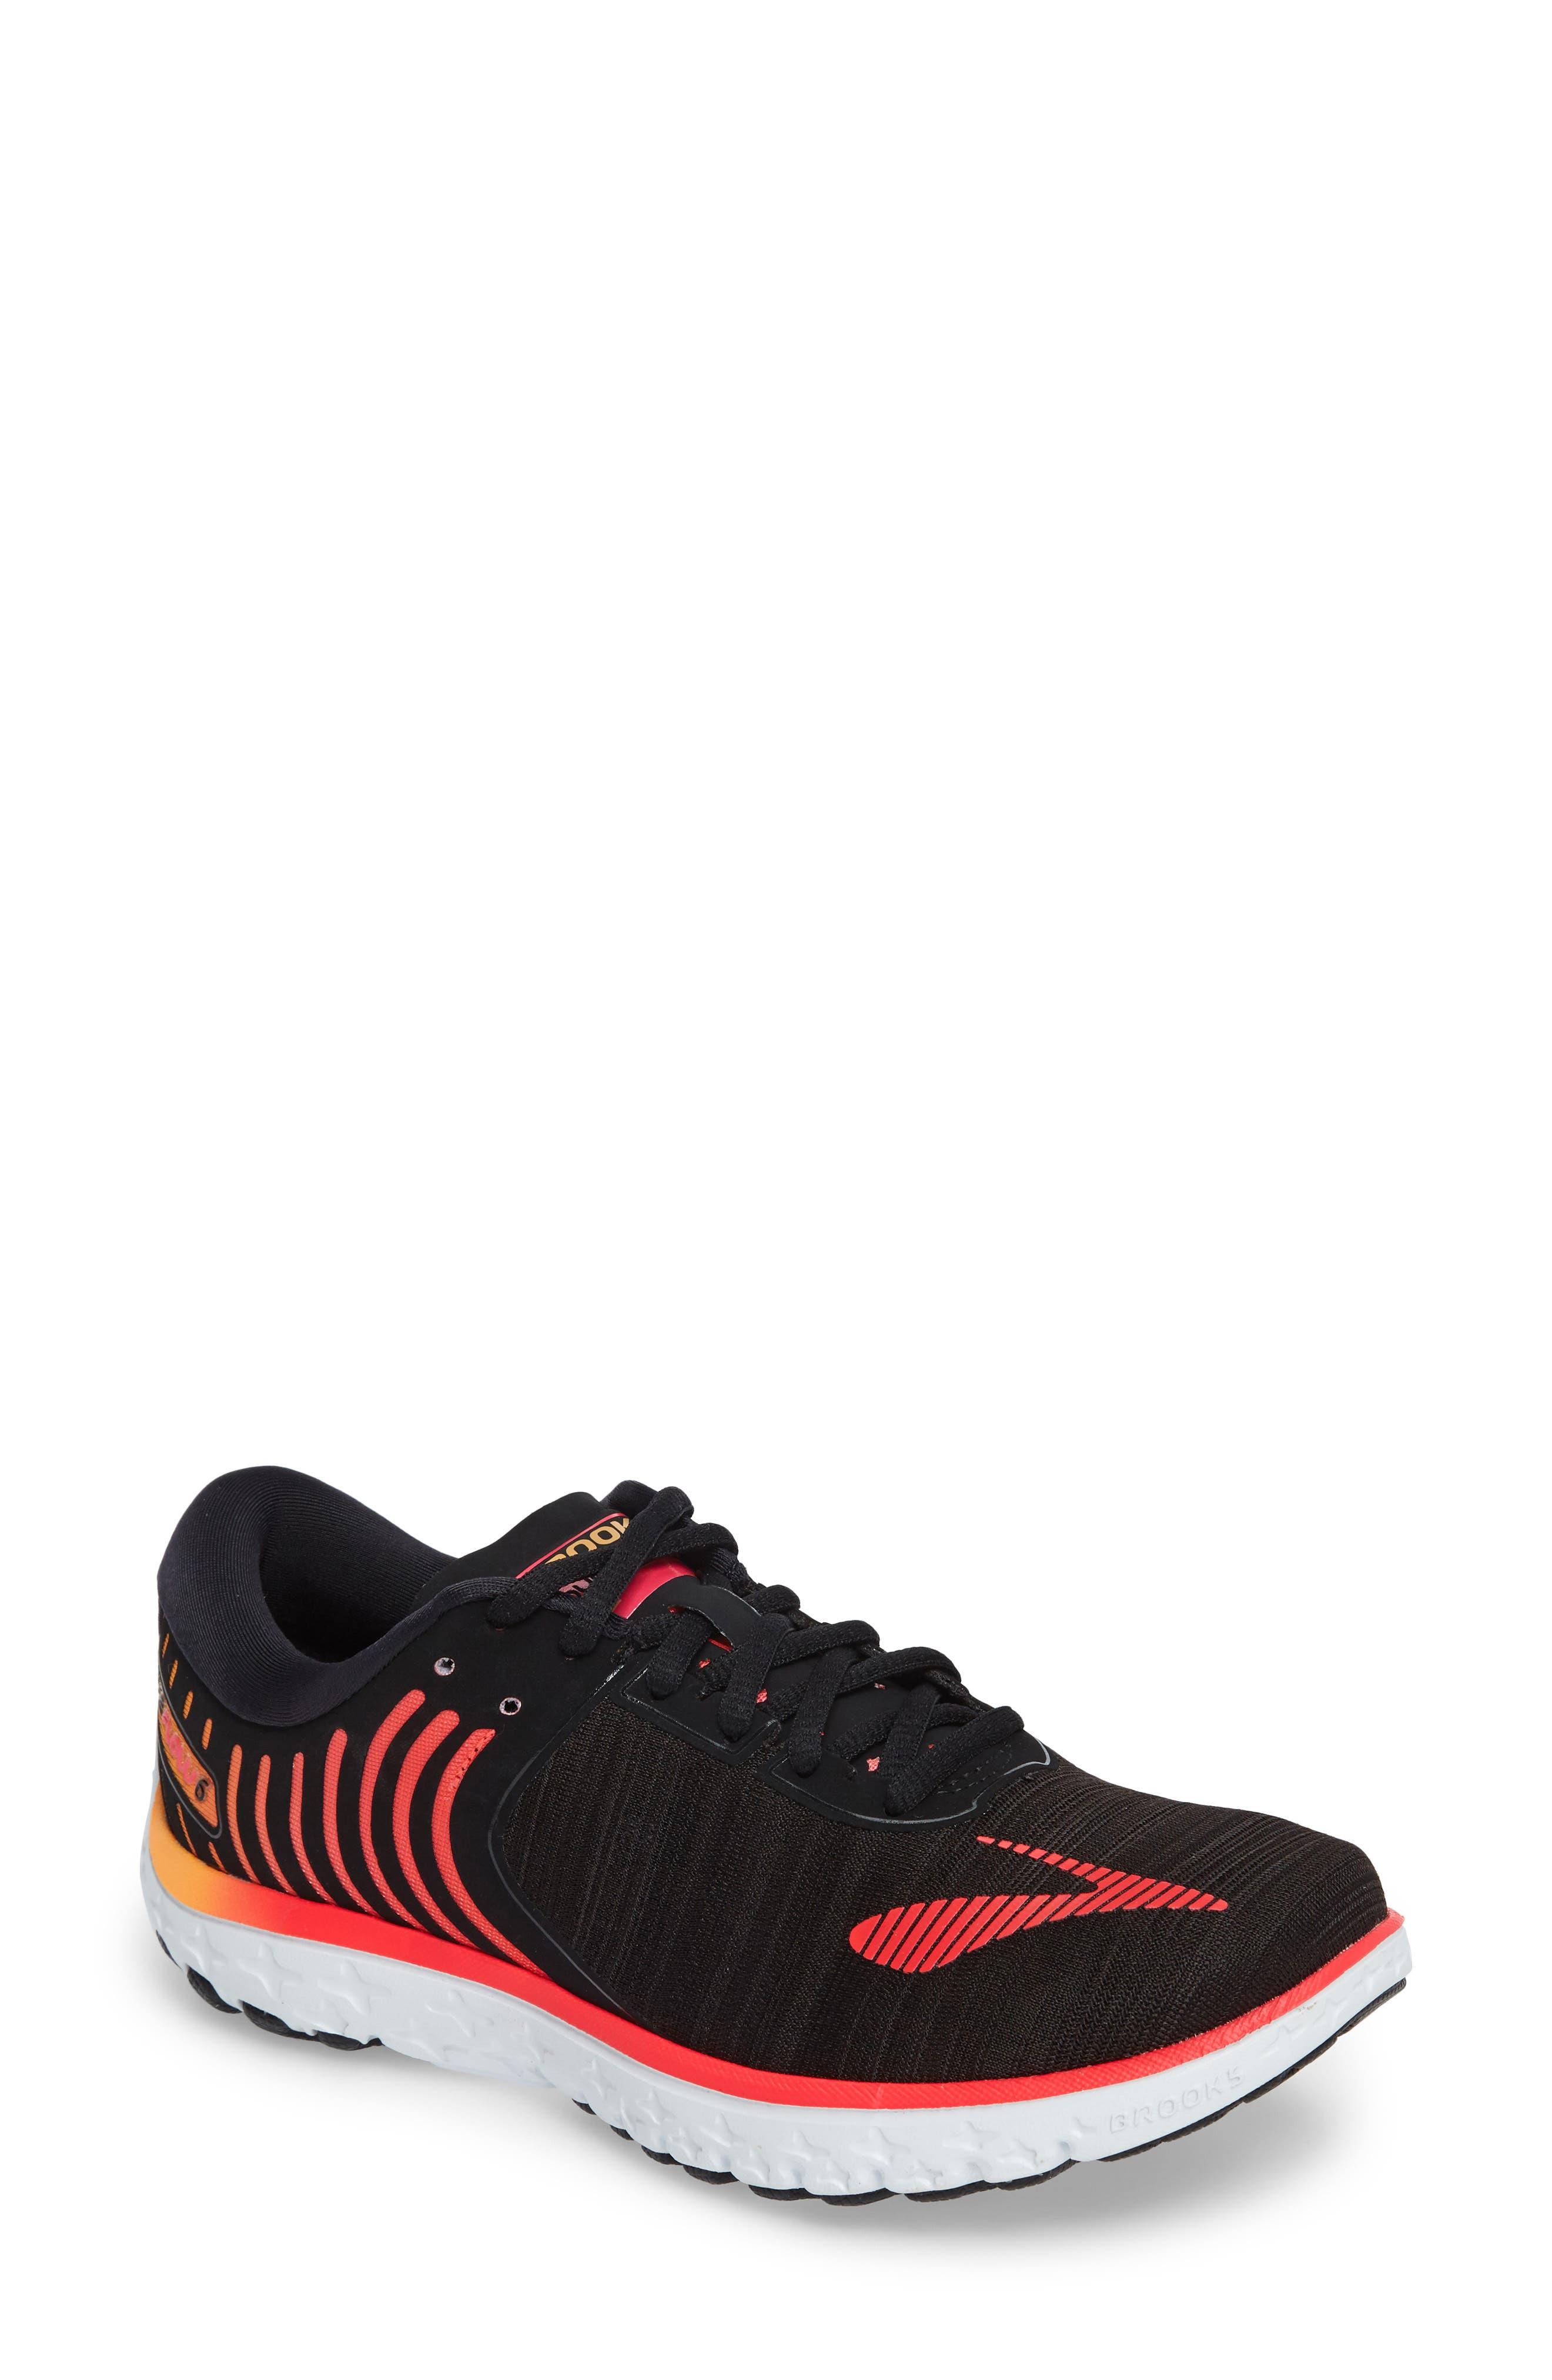 Alternate Image 1 Selected - Brooks PureFlow 6 Running Shoe (Women)